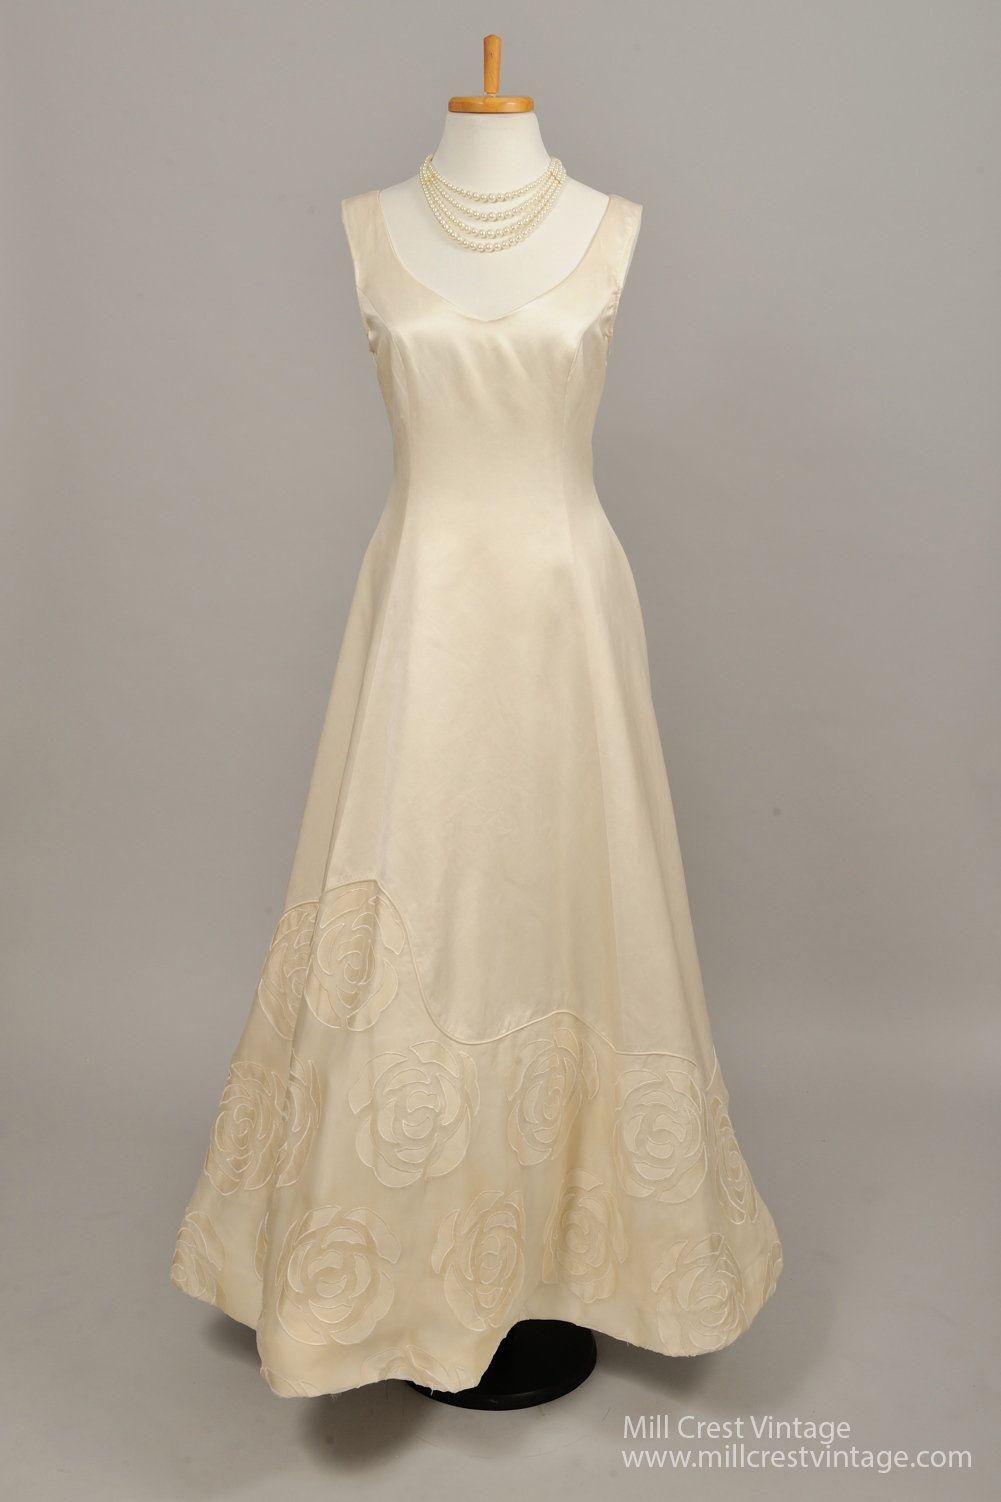 raquel couture vintage wedding gown mill crest vintage